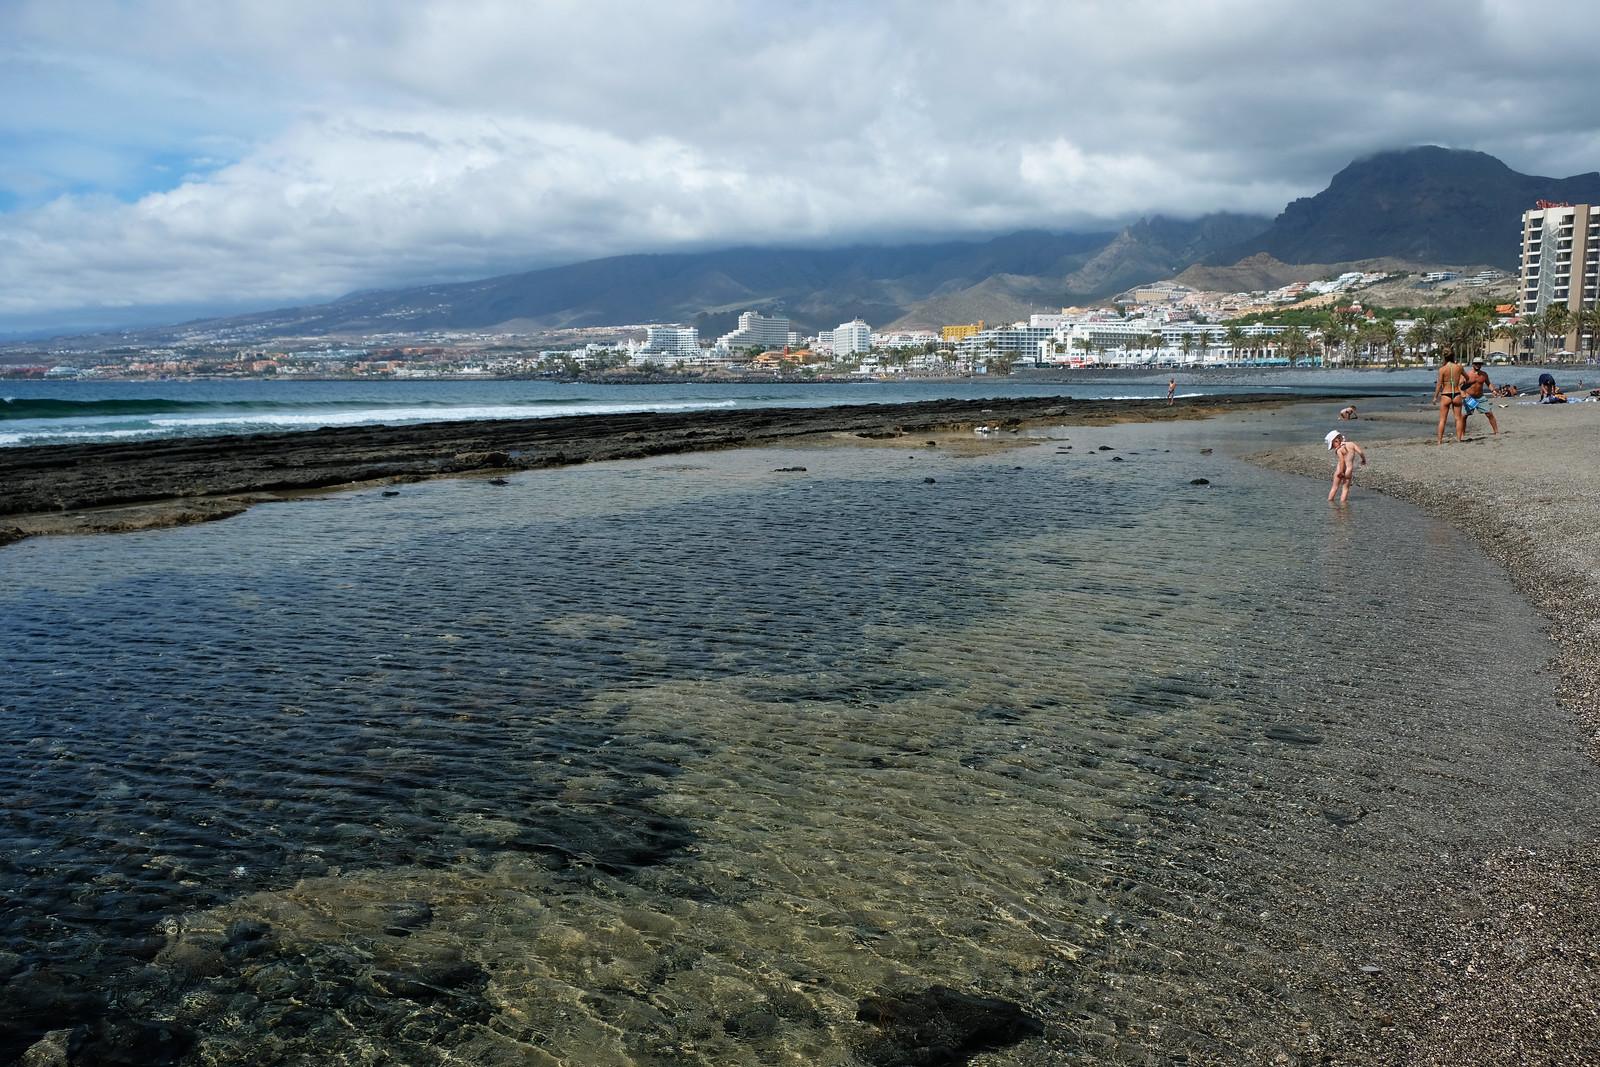 Playa Honda, Playa de las Américas, Tenerife, Canary Islands, Spain